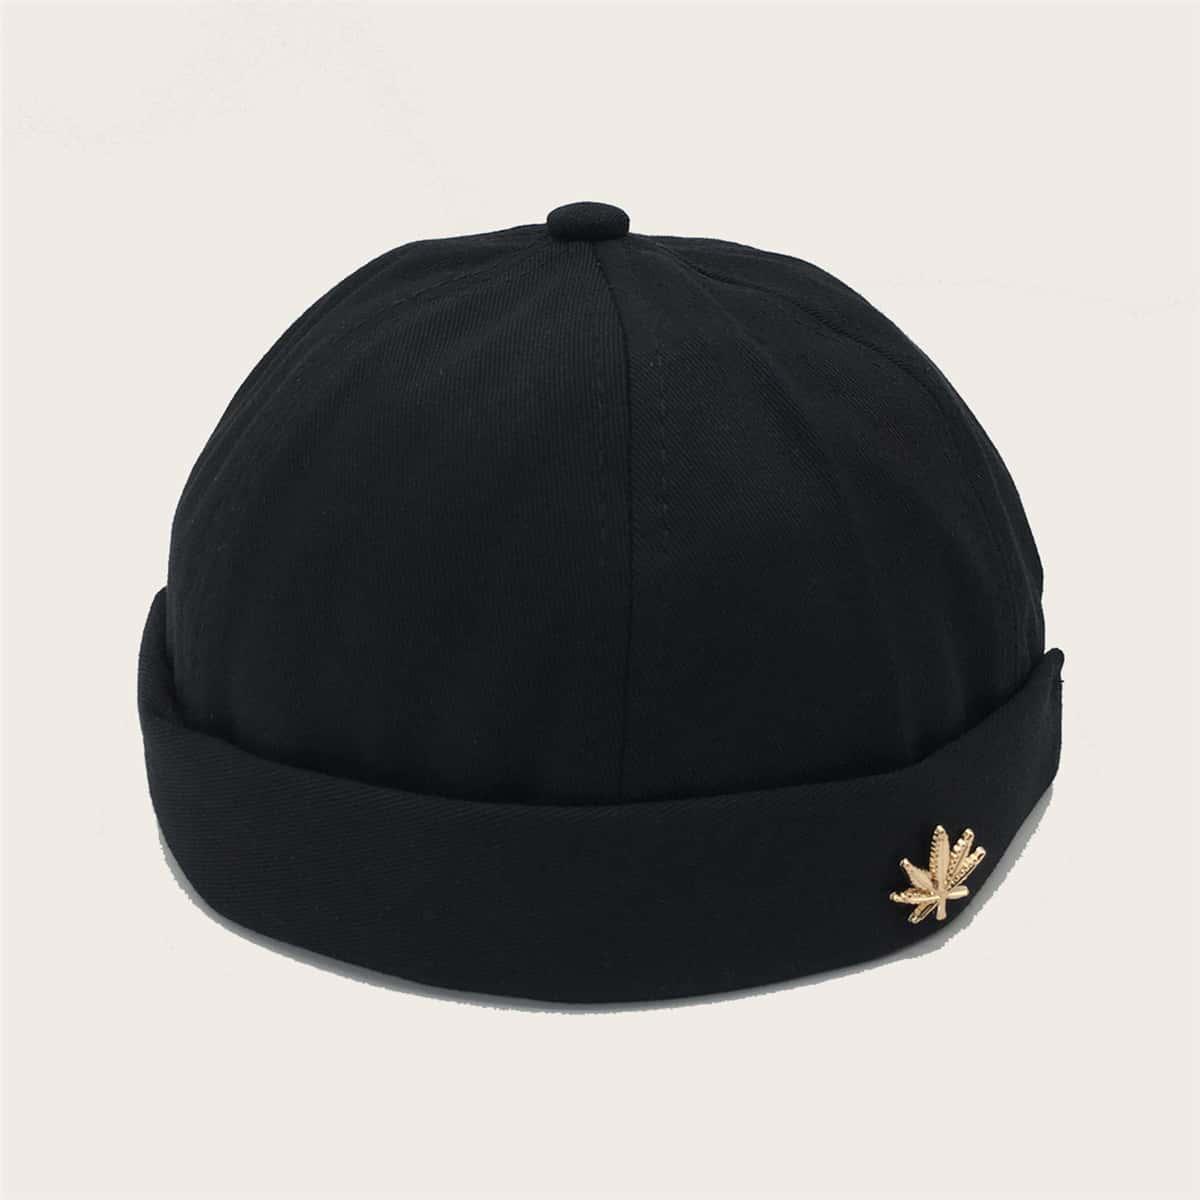 Мужская шляпа с декором листа от SHEIN